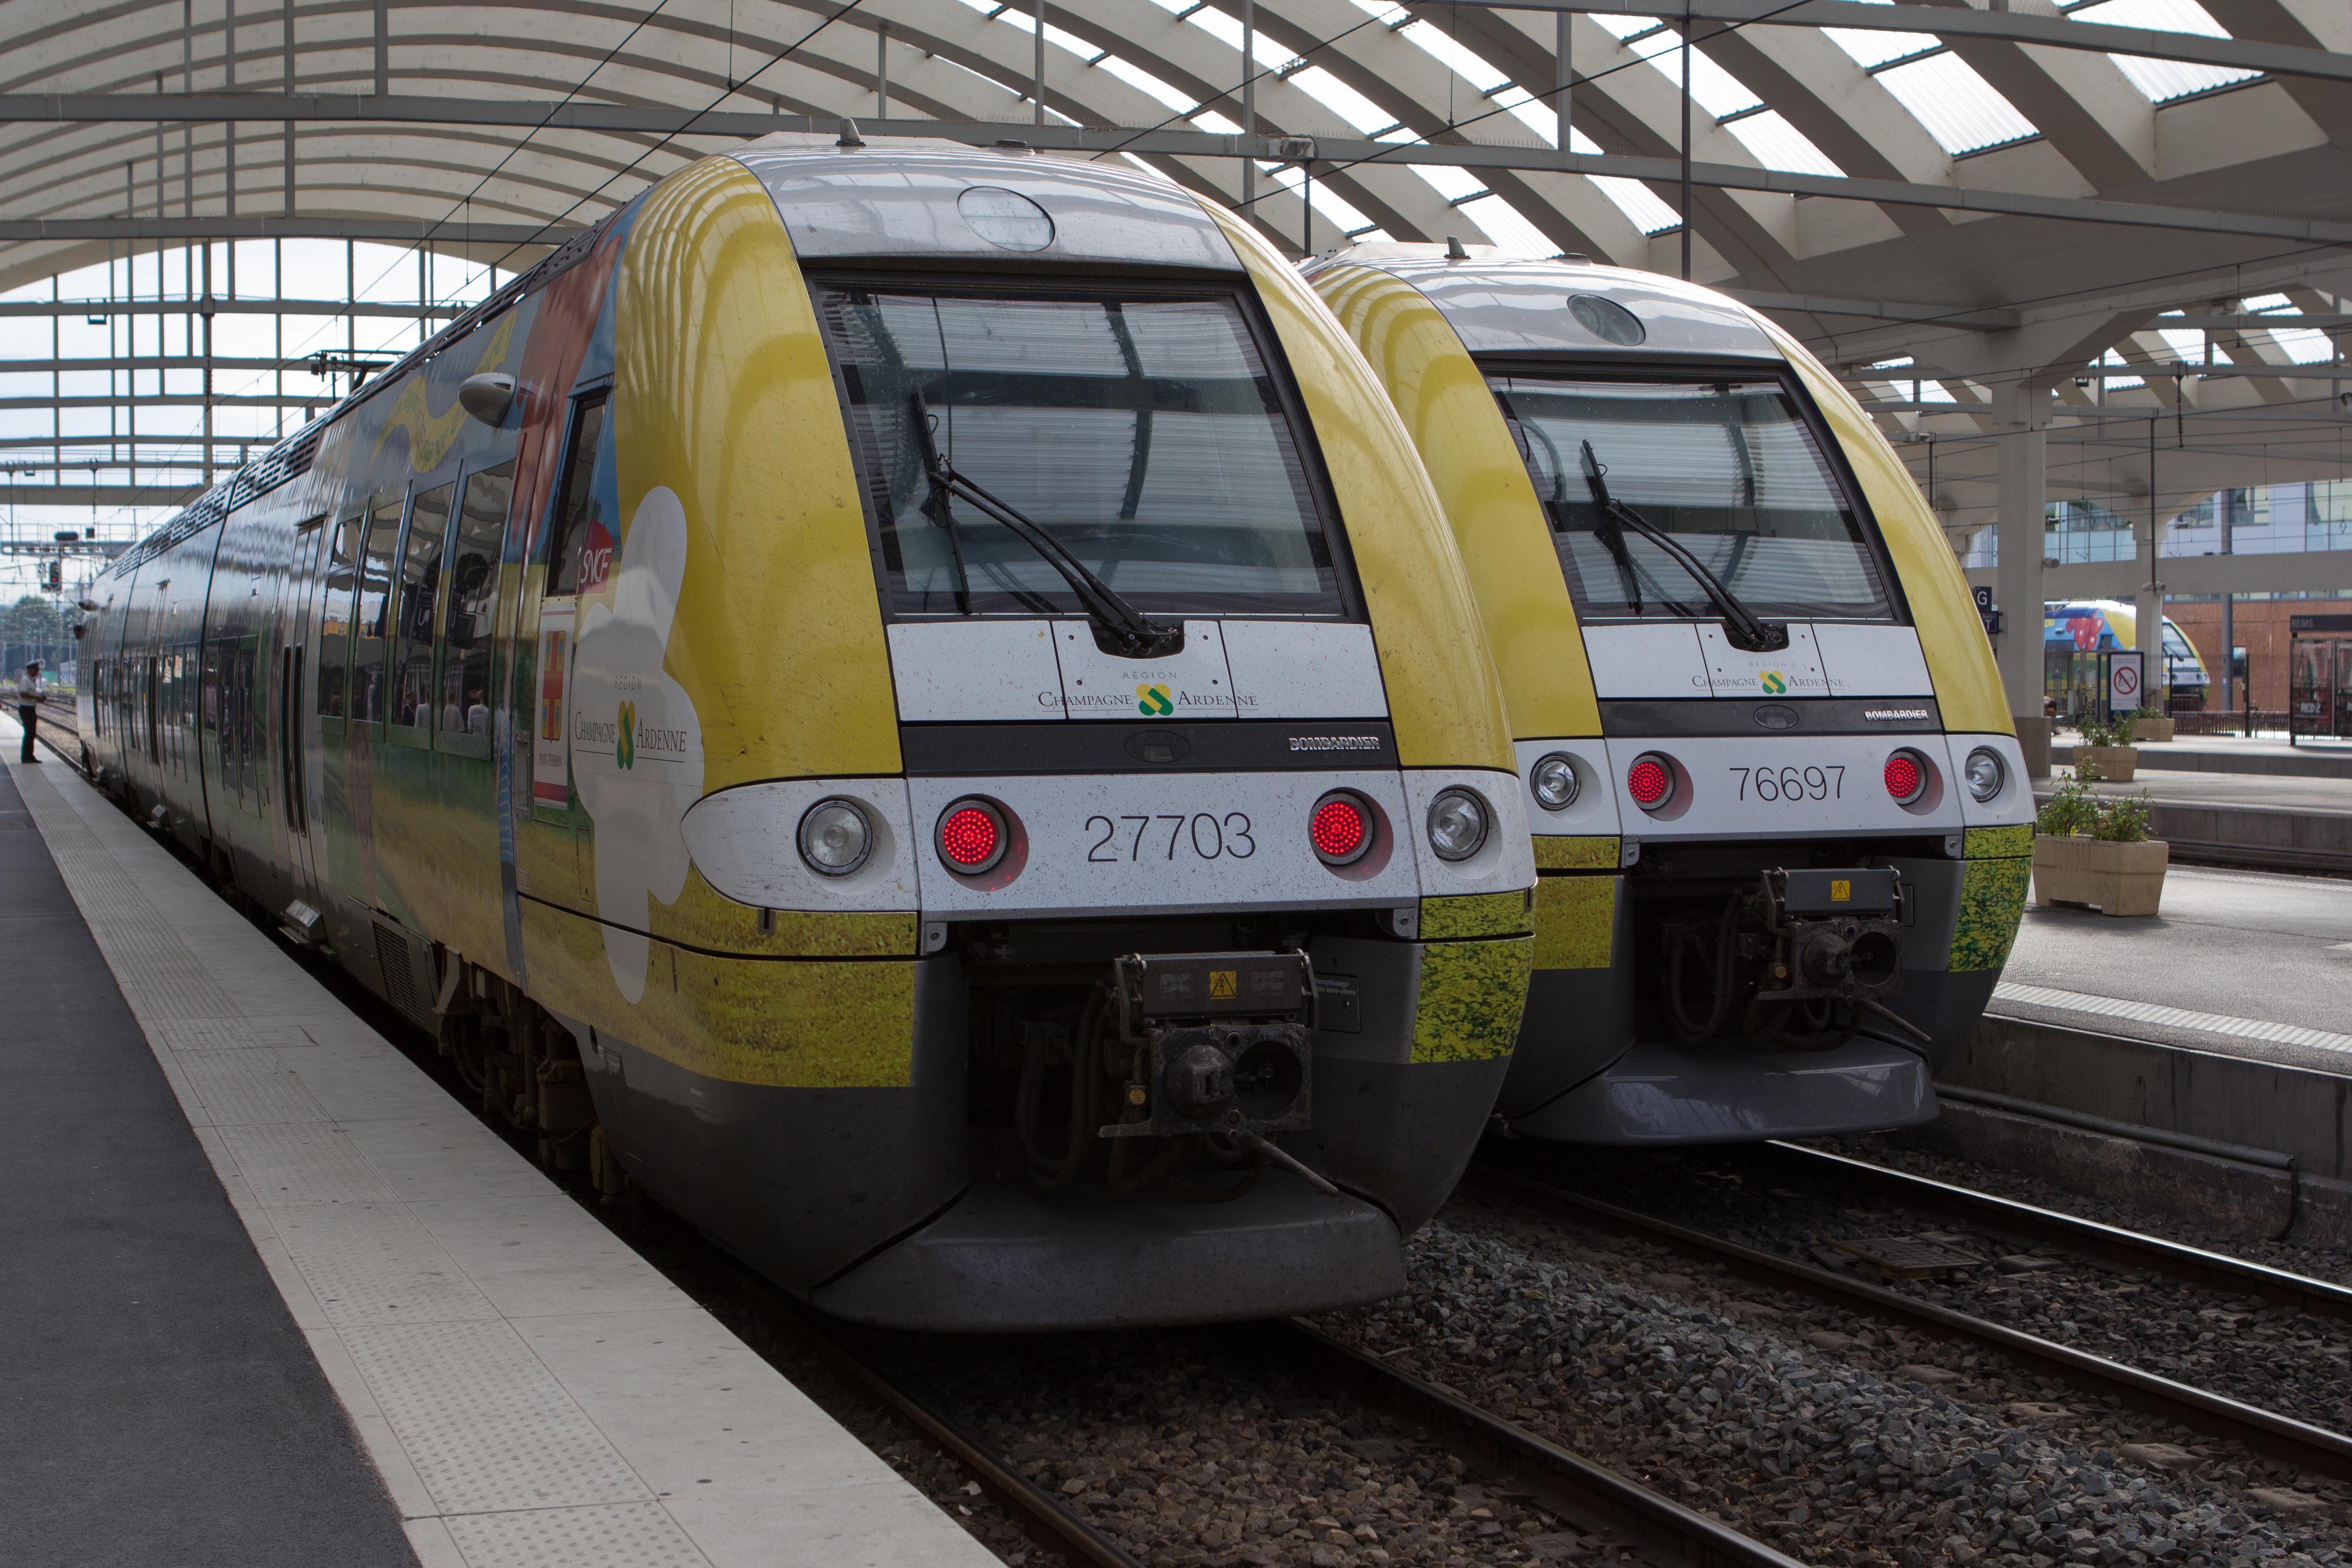 File:Gare de Reims - IMG 2387.jpg